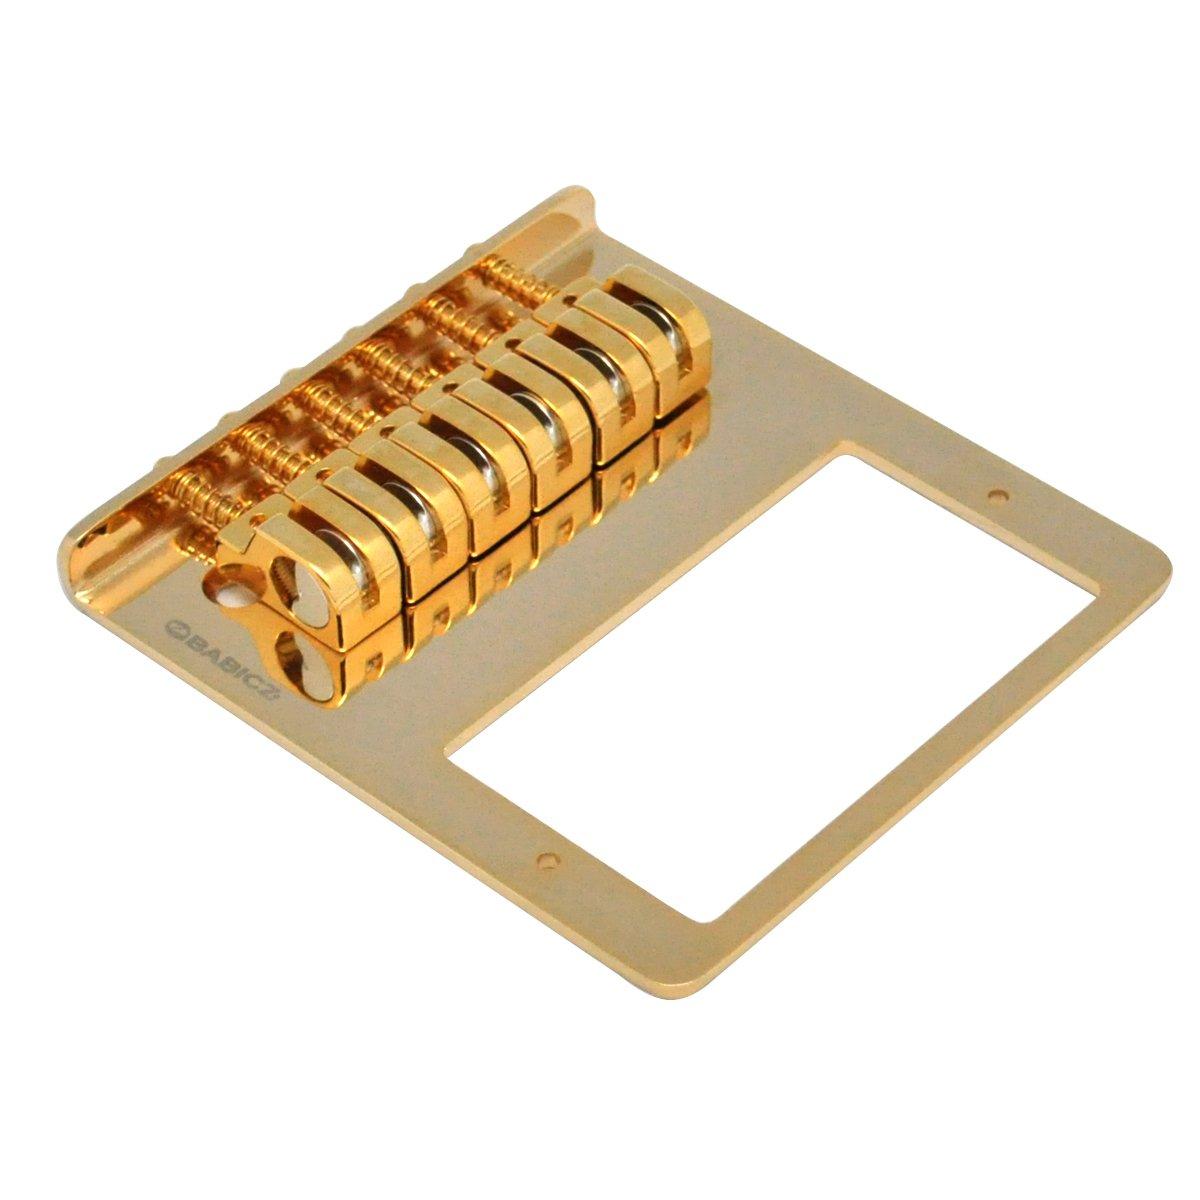 Babicz FCHZTLHGD Full Contact Hardware, Z Series Tele Humbucker Bridge, Gold by Babicz (Image #1)